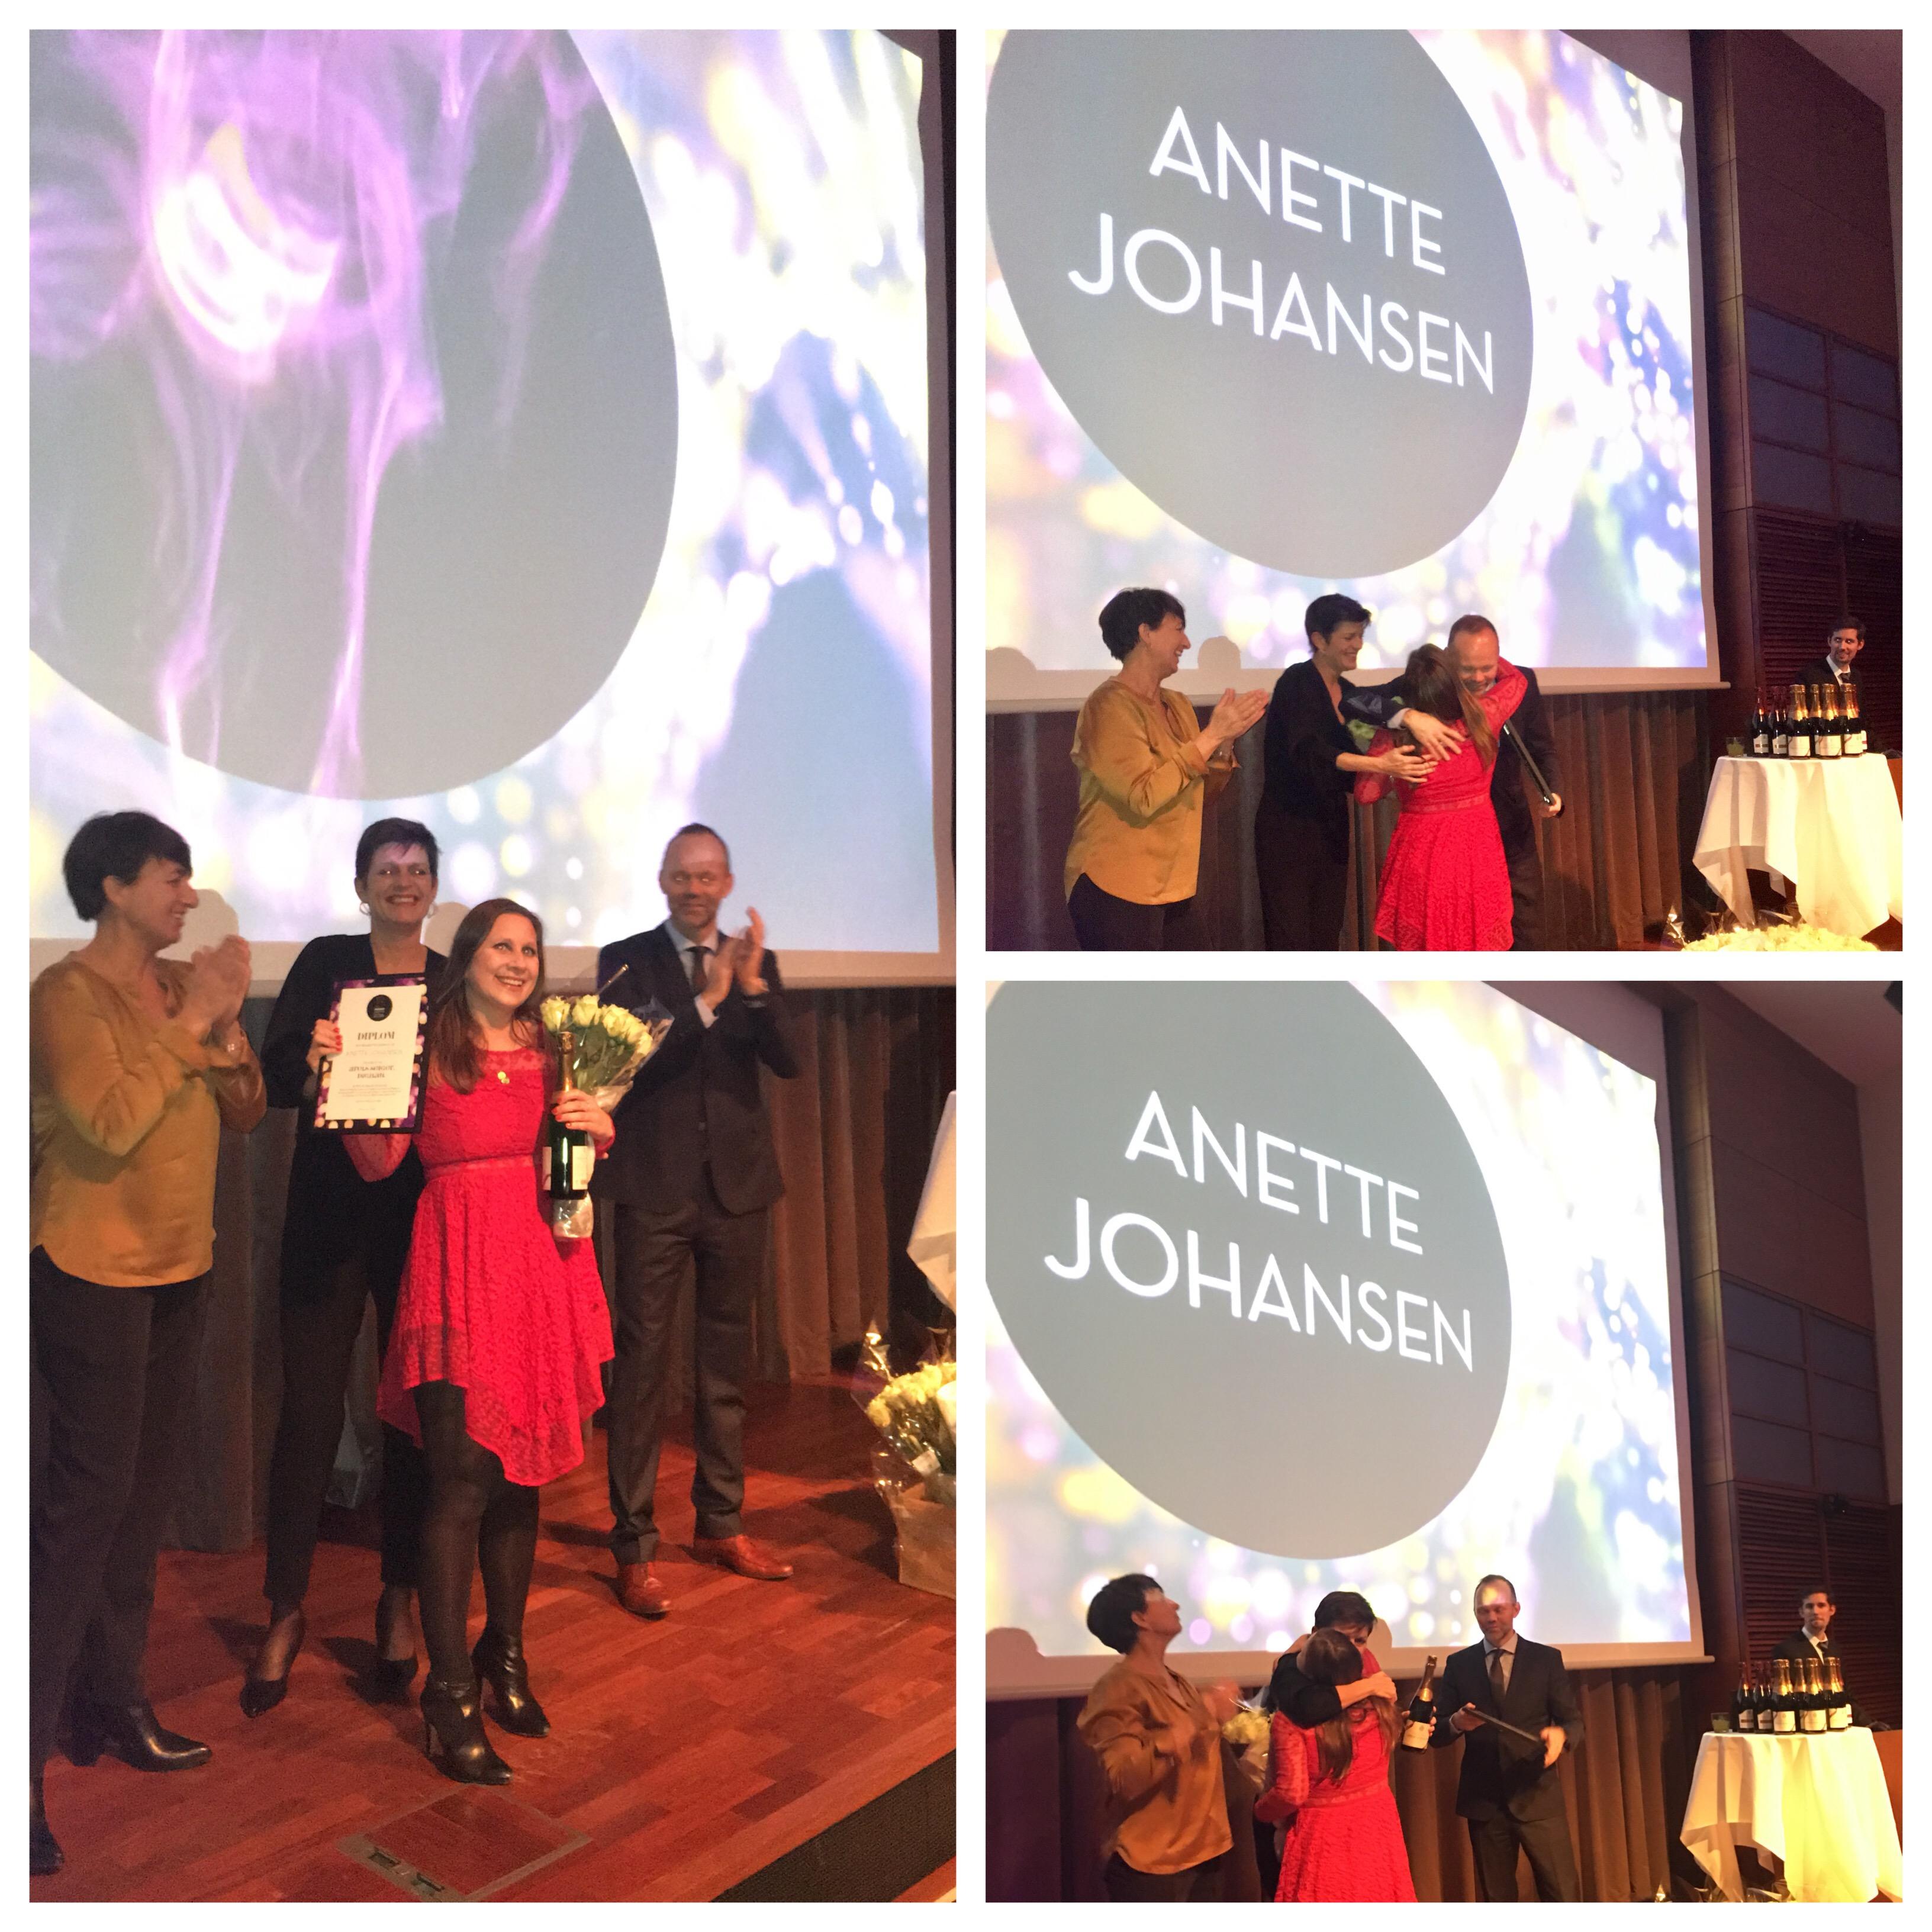 2016 Bonnier Awards Julebord